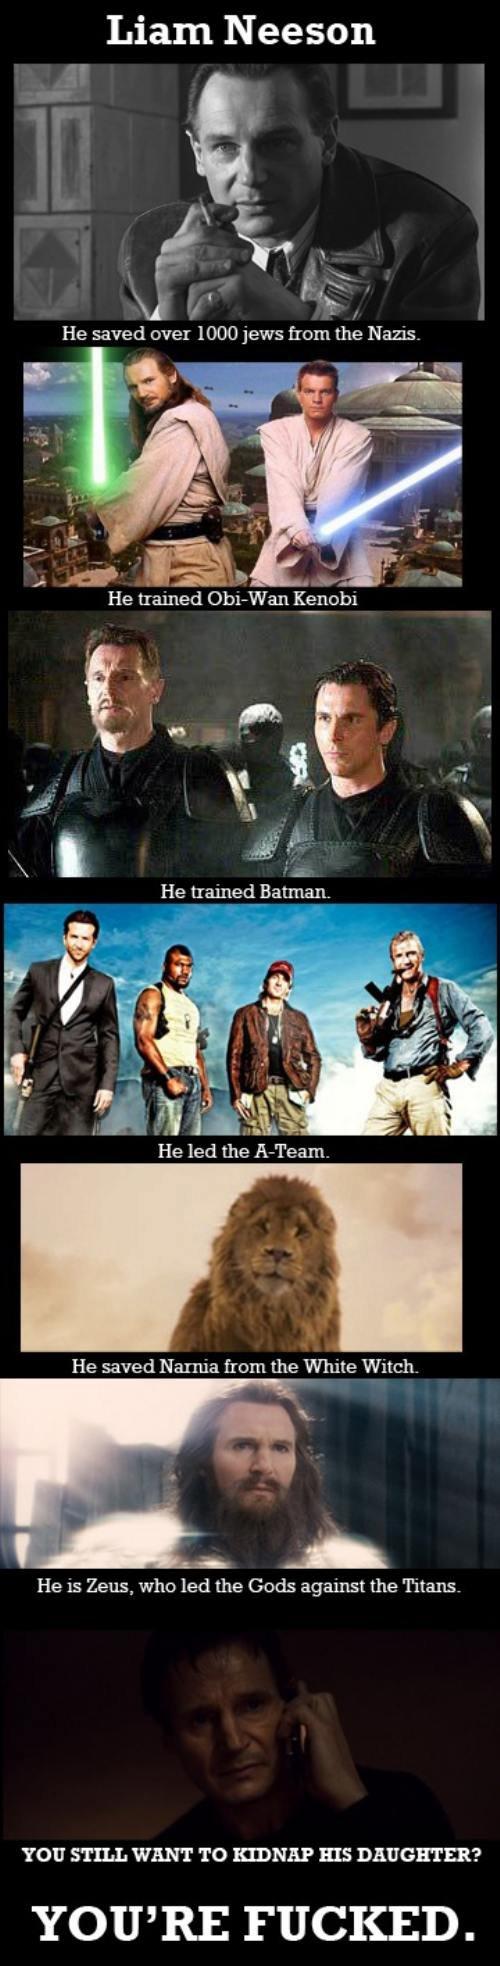 Liam Neeson. had this laying around.